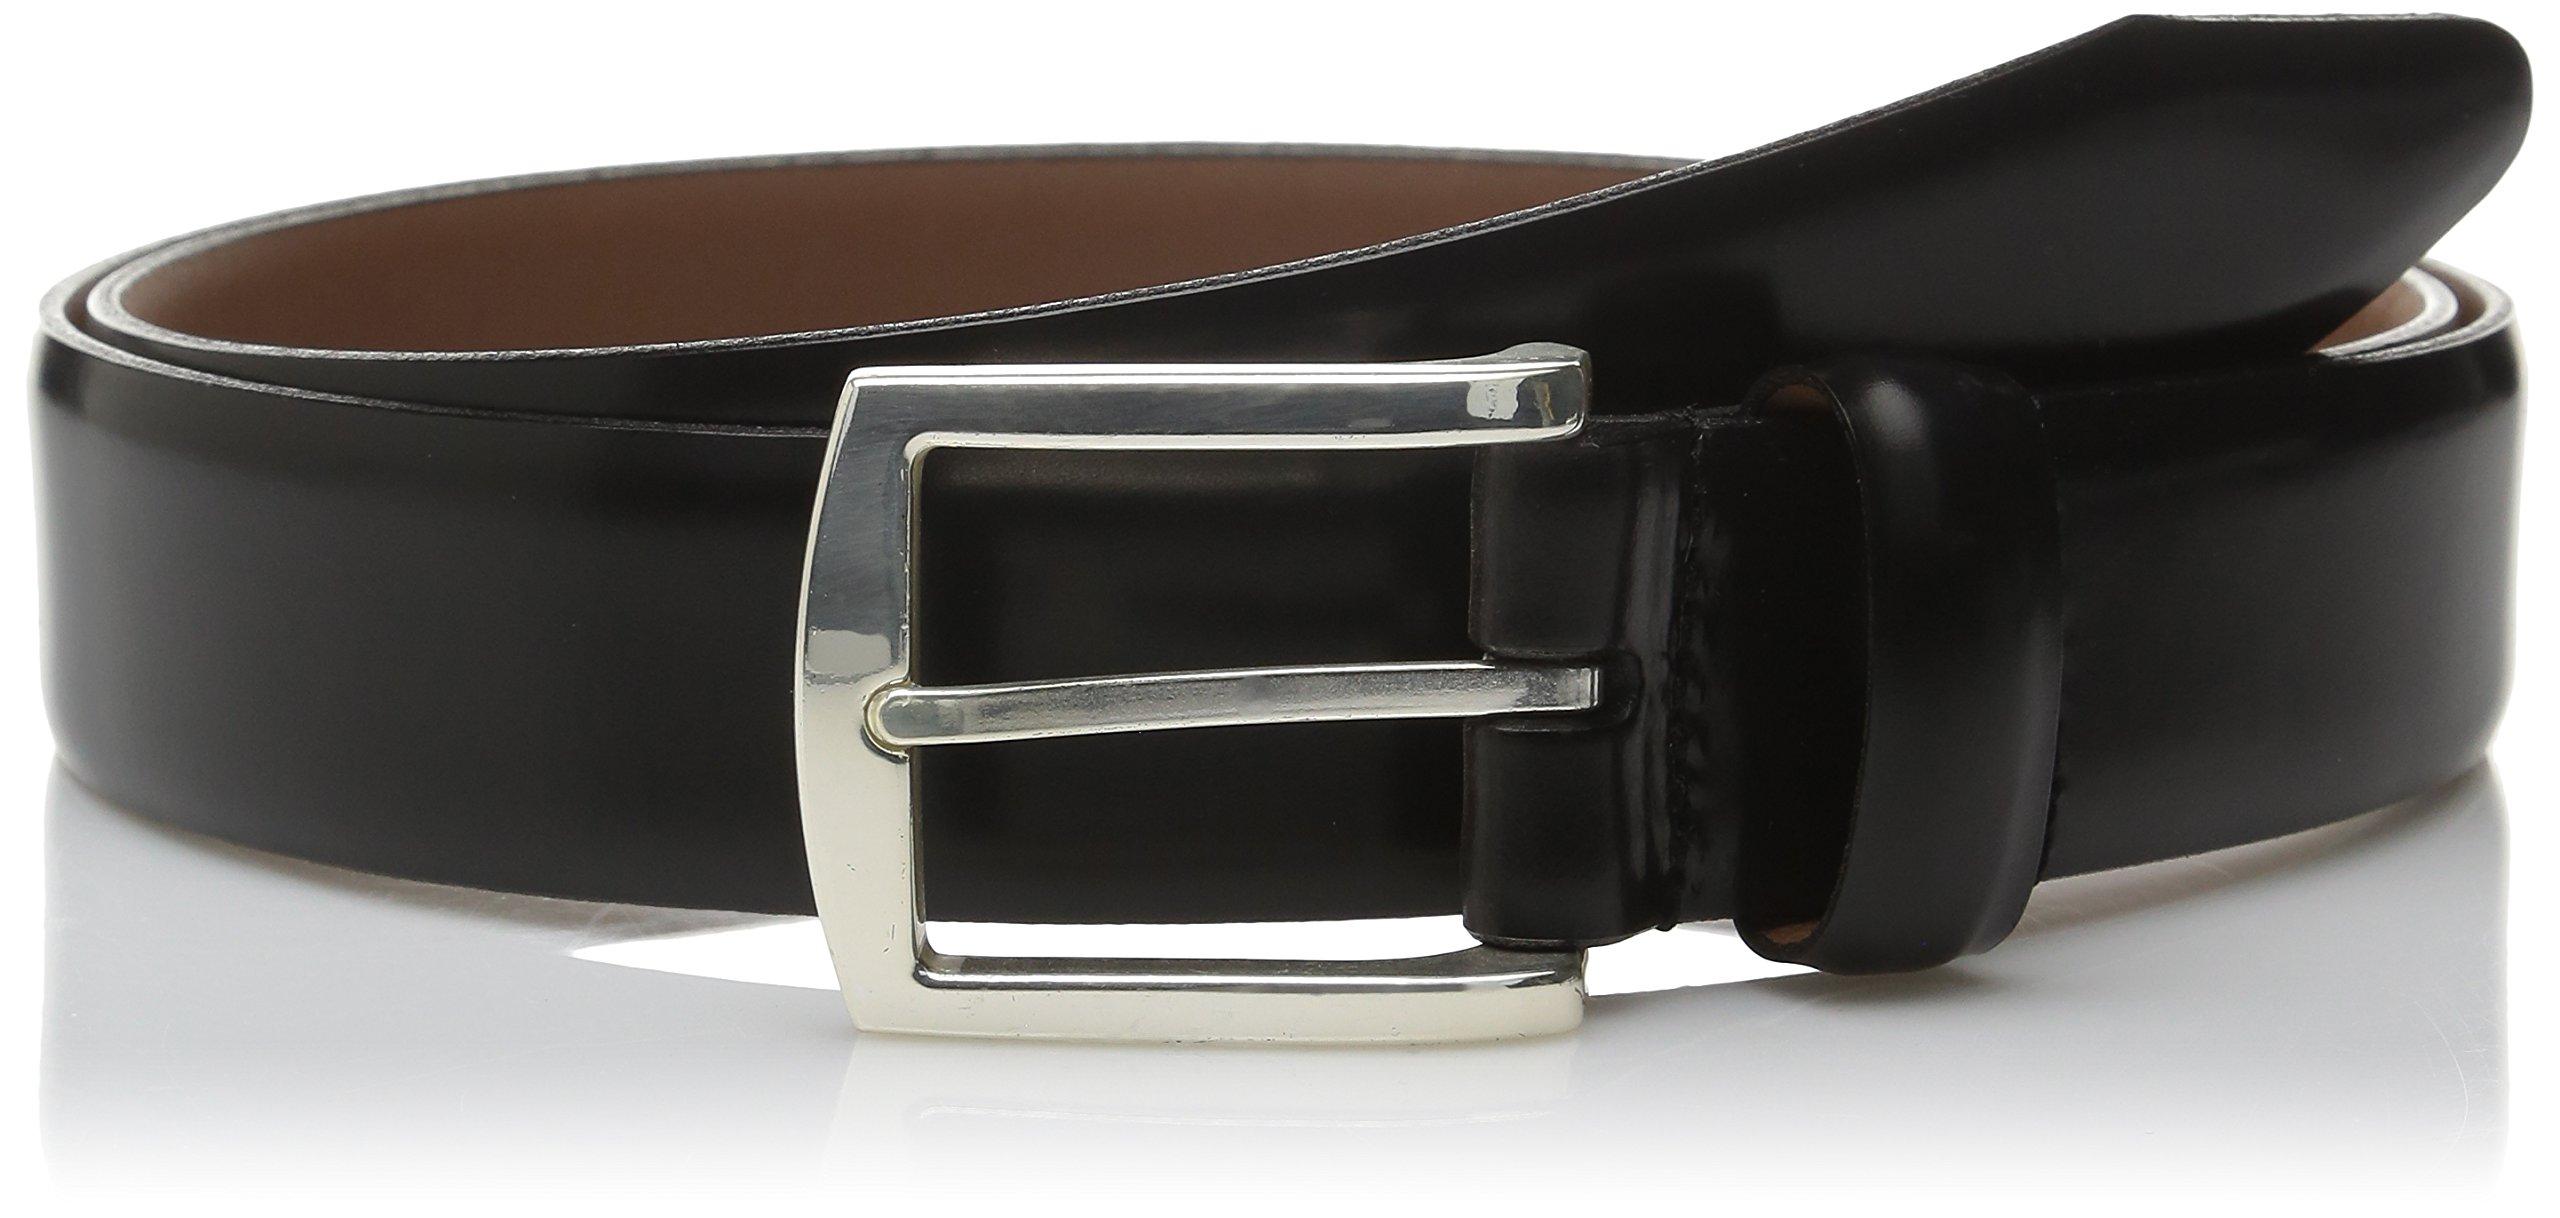 Allen Edmonds Men's Midland Ave Belt, Black, 036 Standard